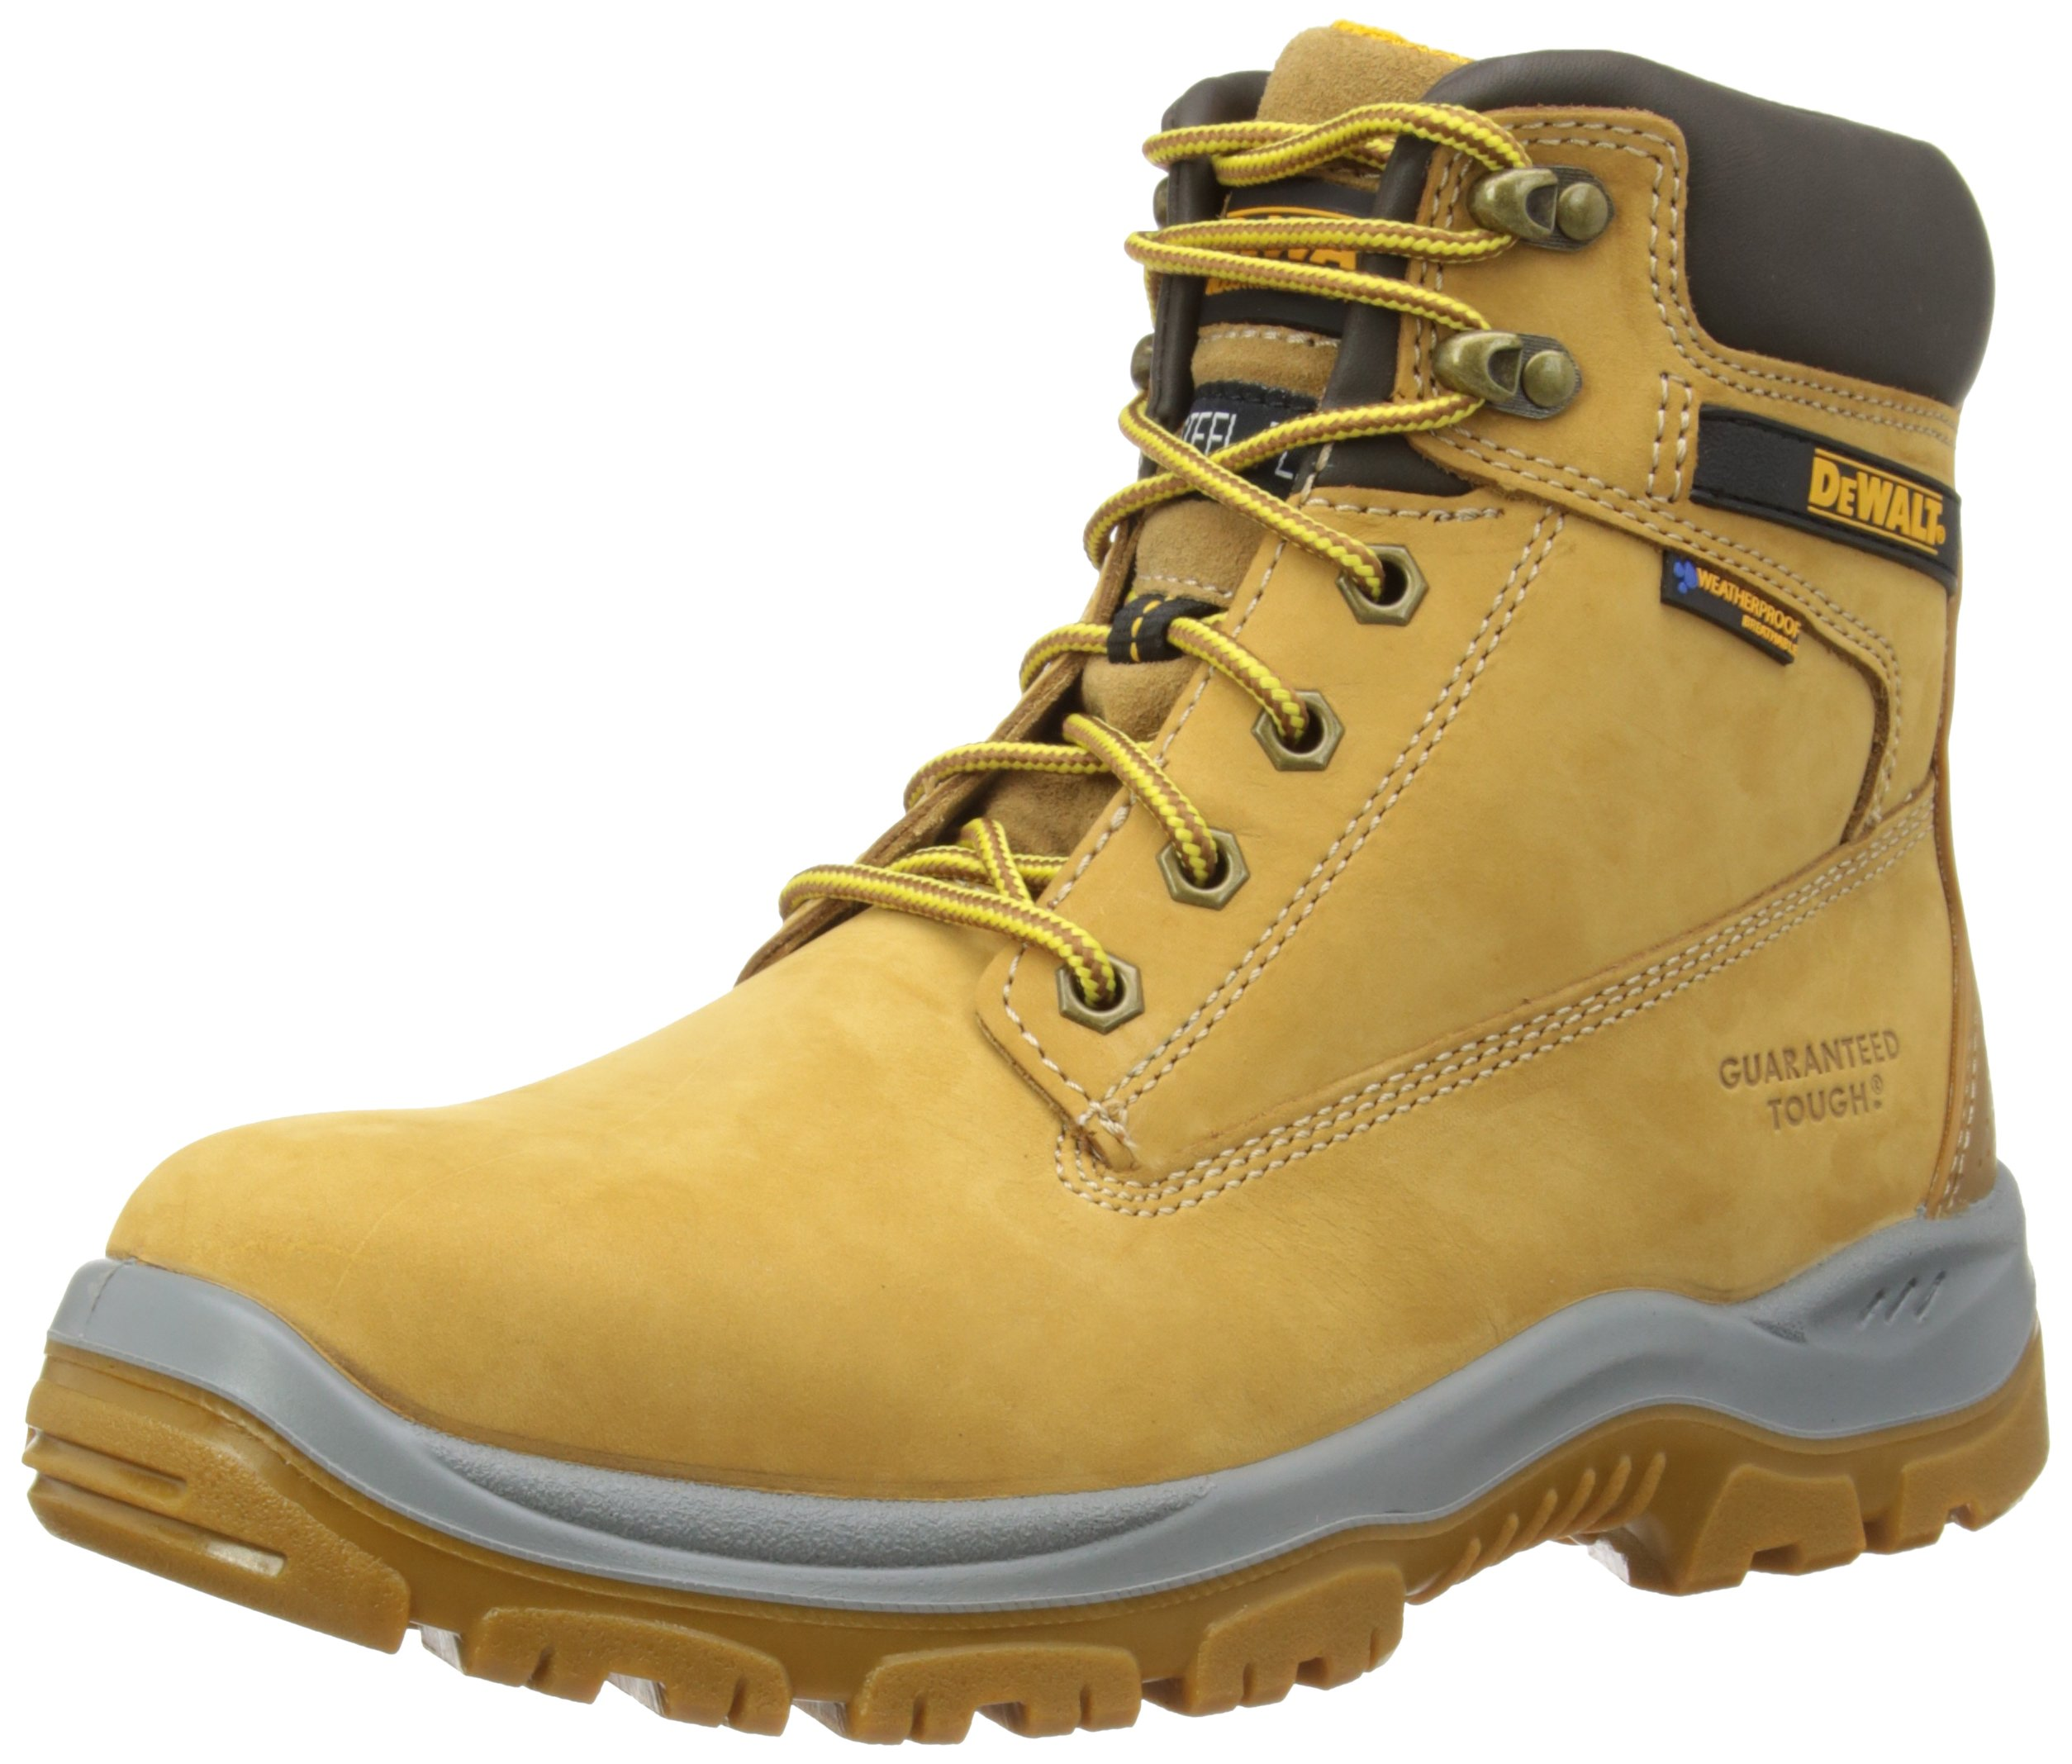 Titanium Safety Boots, Hone